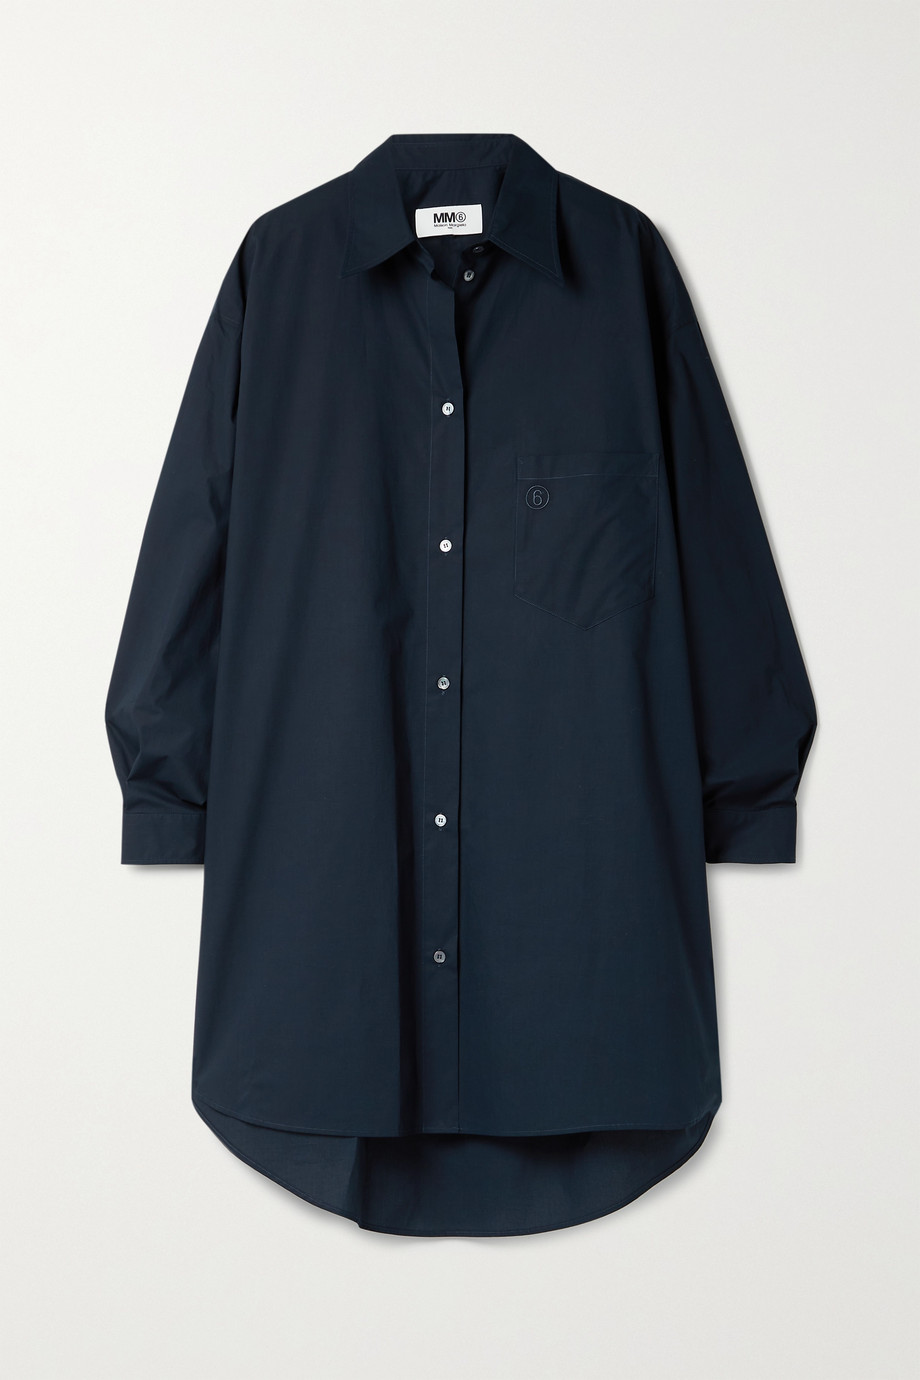 MM6 Maison Margiela Oversized-Hemdblusenkleid aus Baumwollpopeline